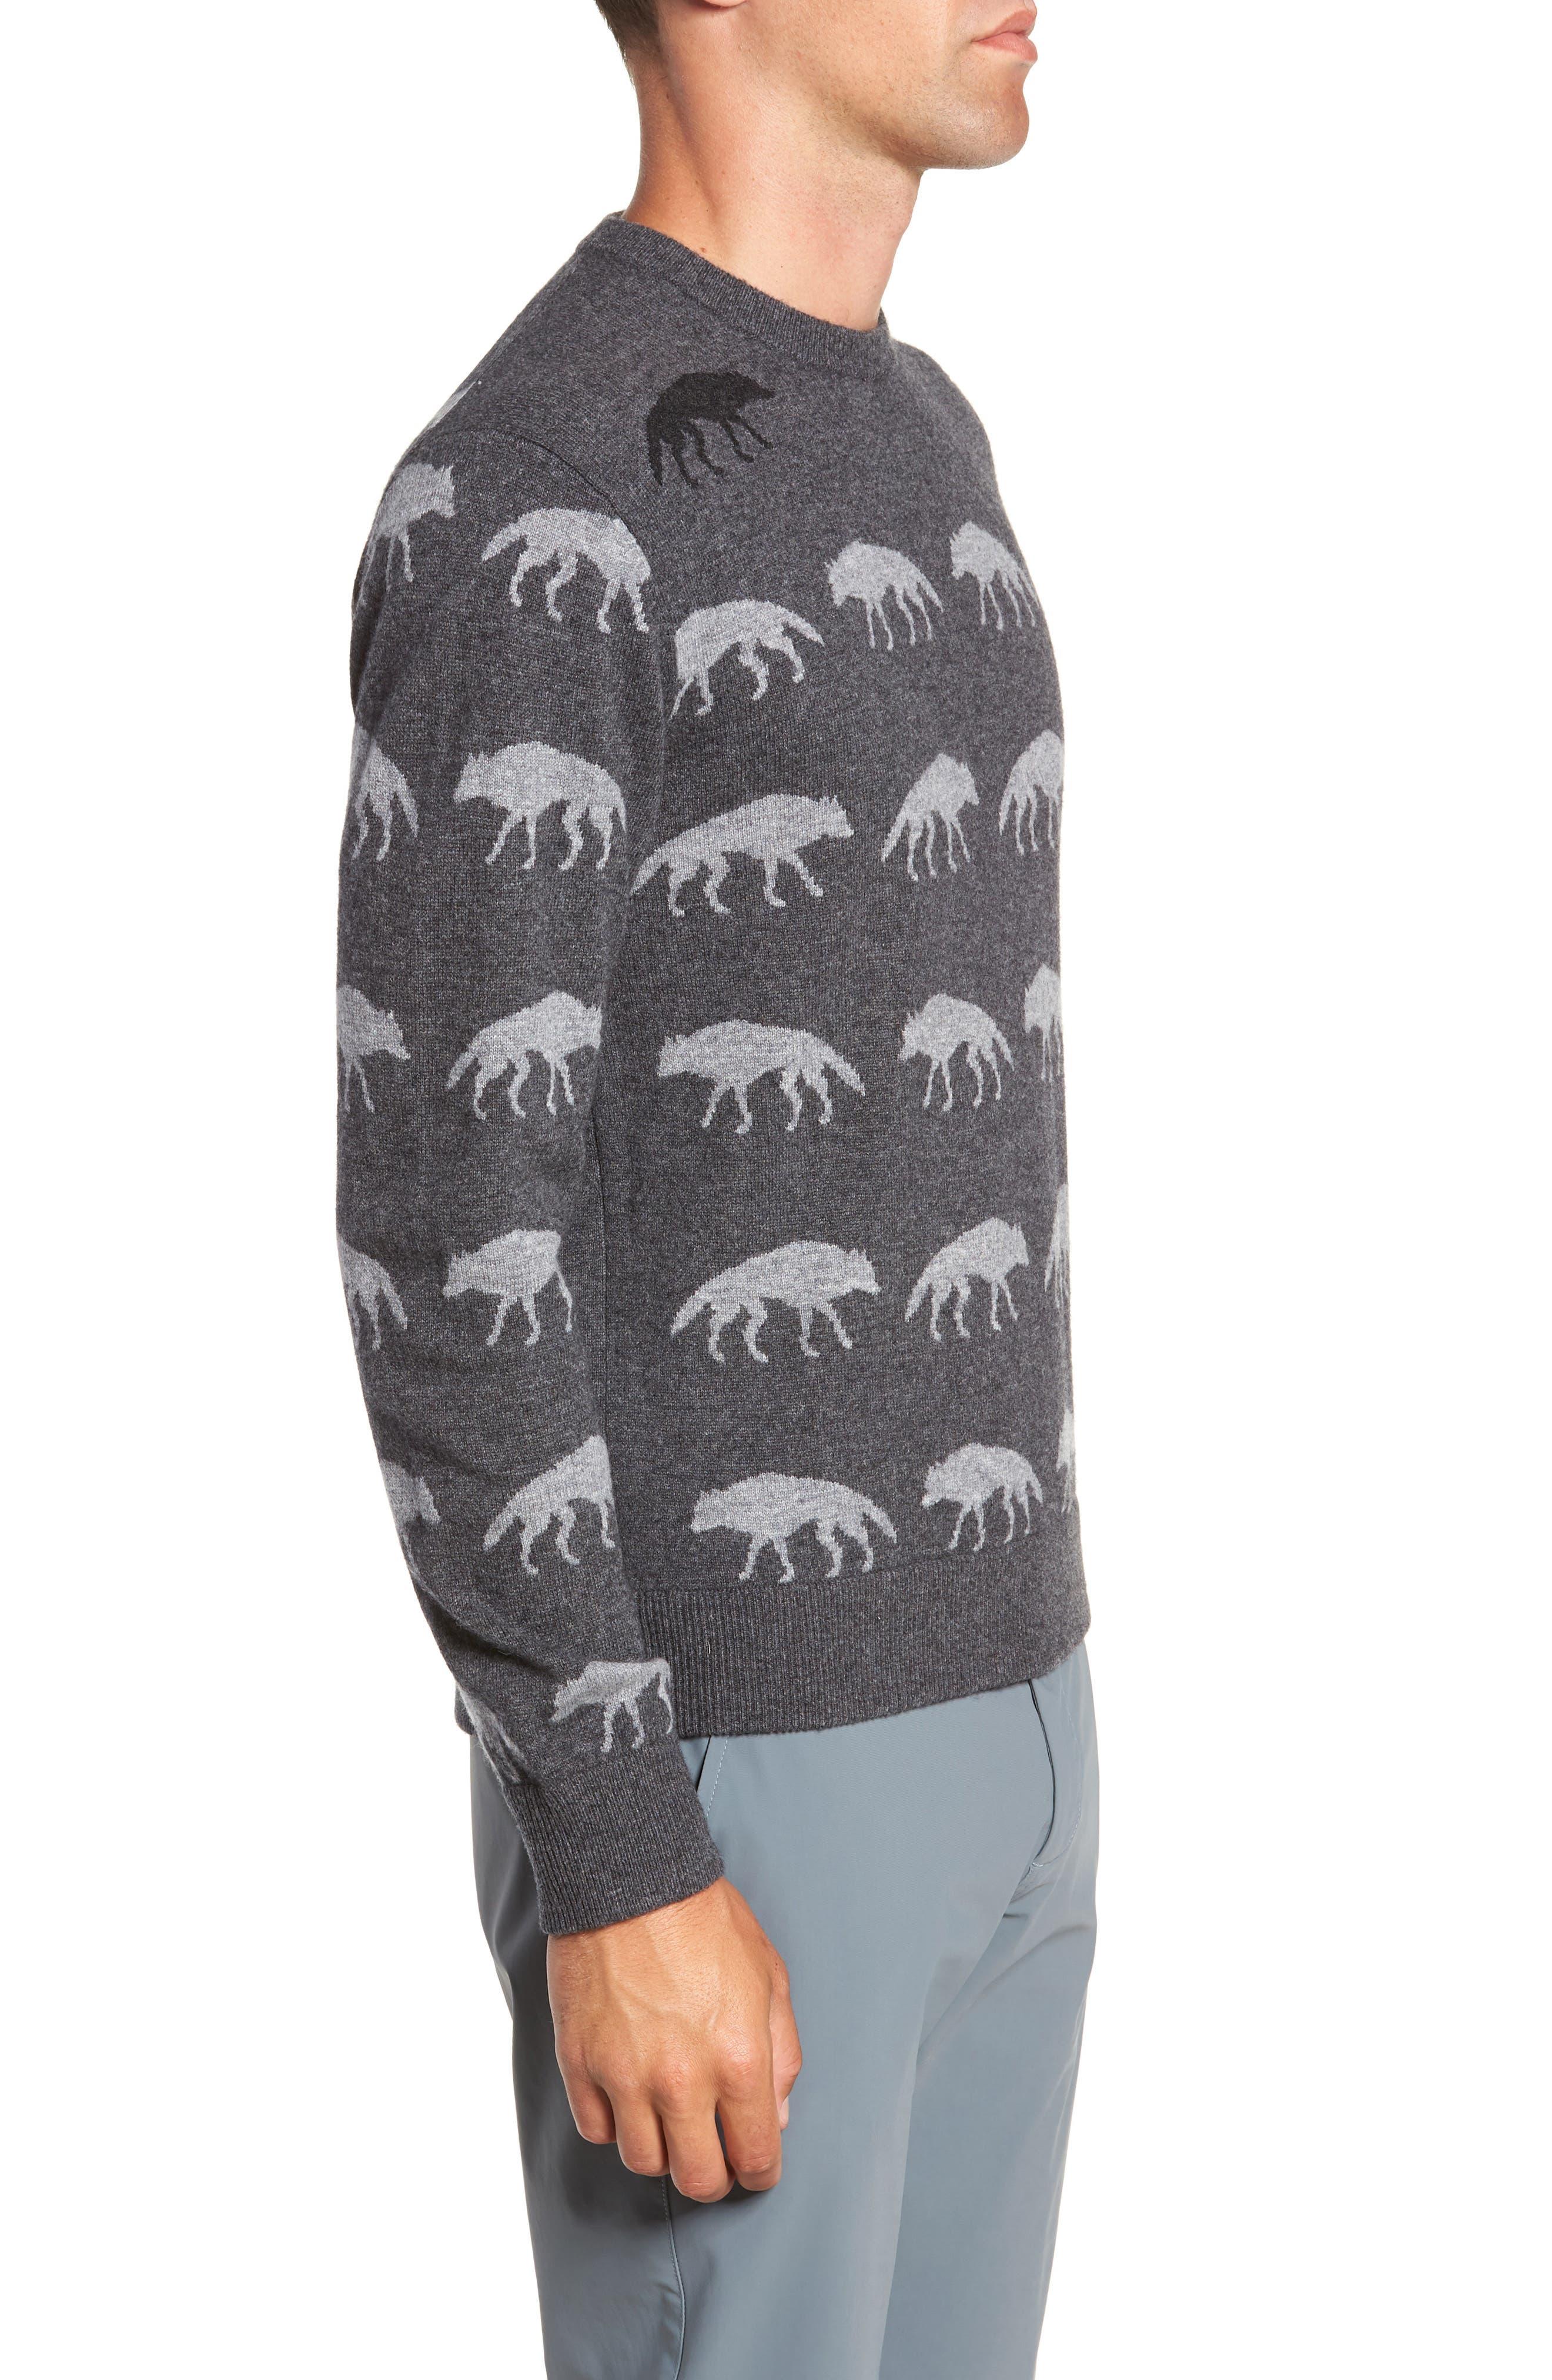 Alphawolf Intarsia Crewneck Sweater,                             Alternate thumbnail 3, color,                             GREY HEATHER